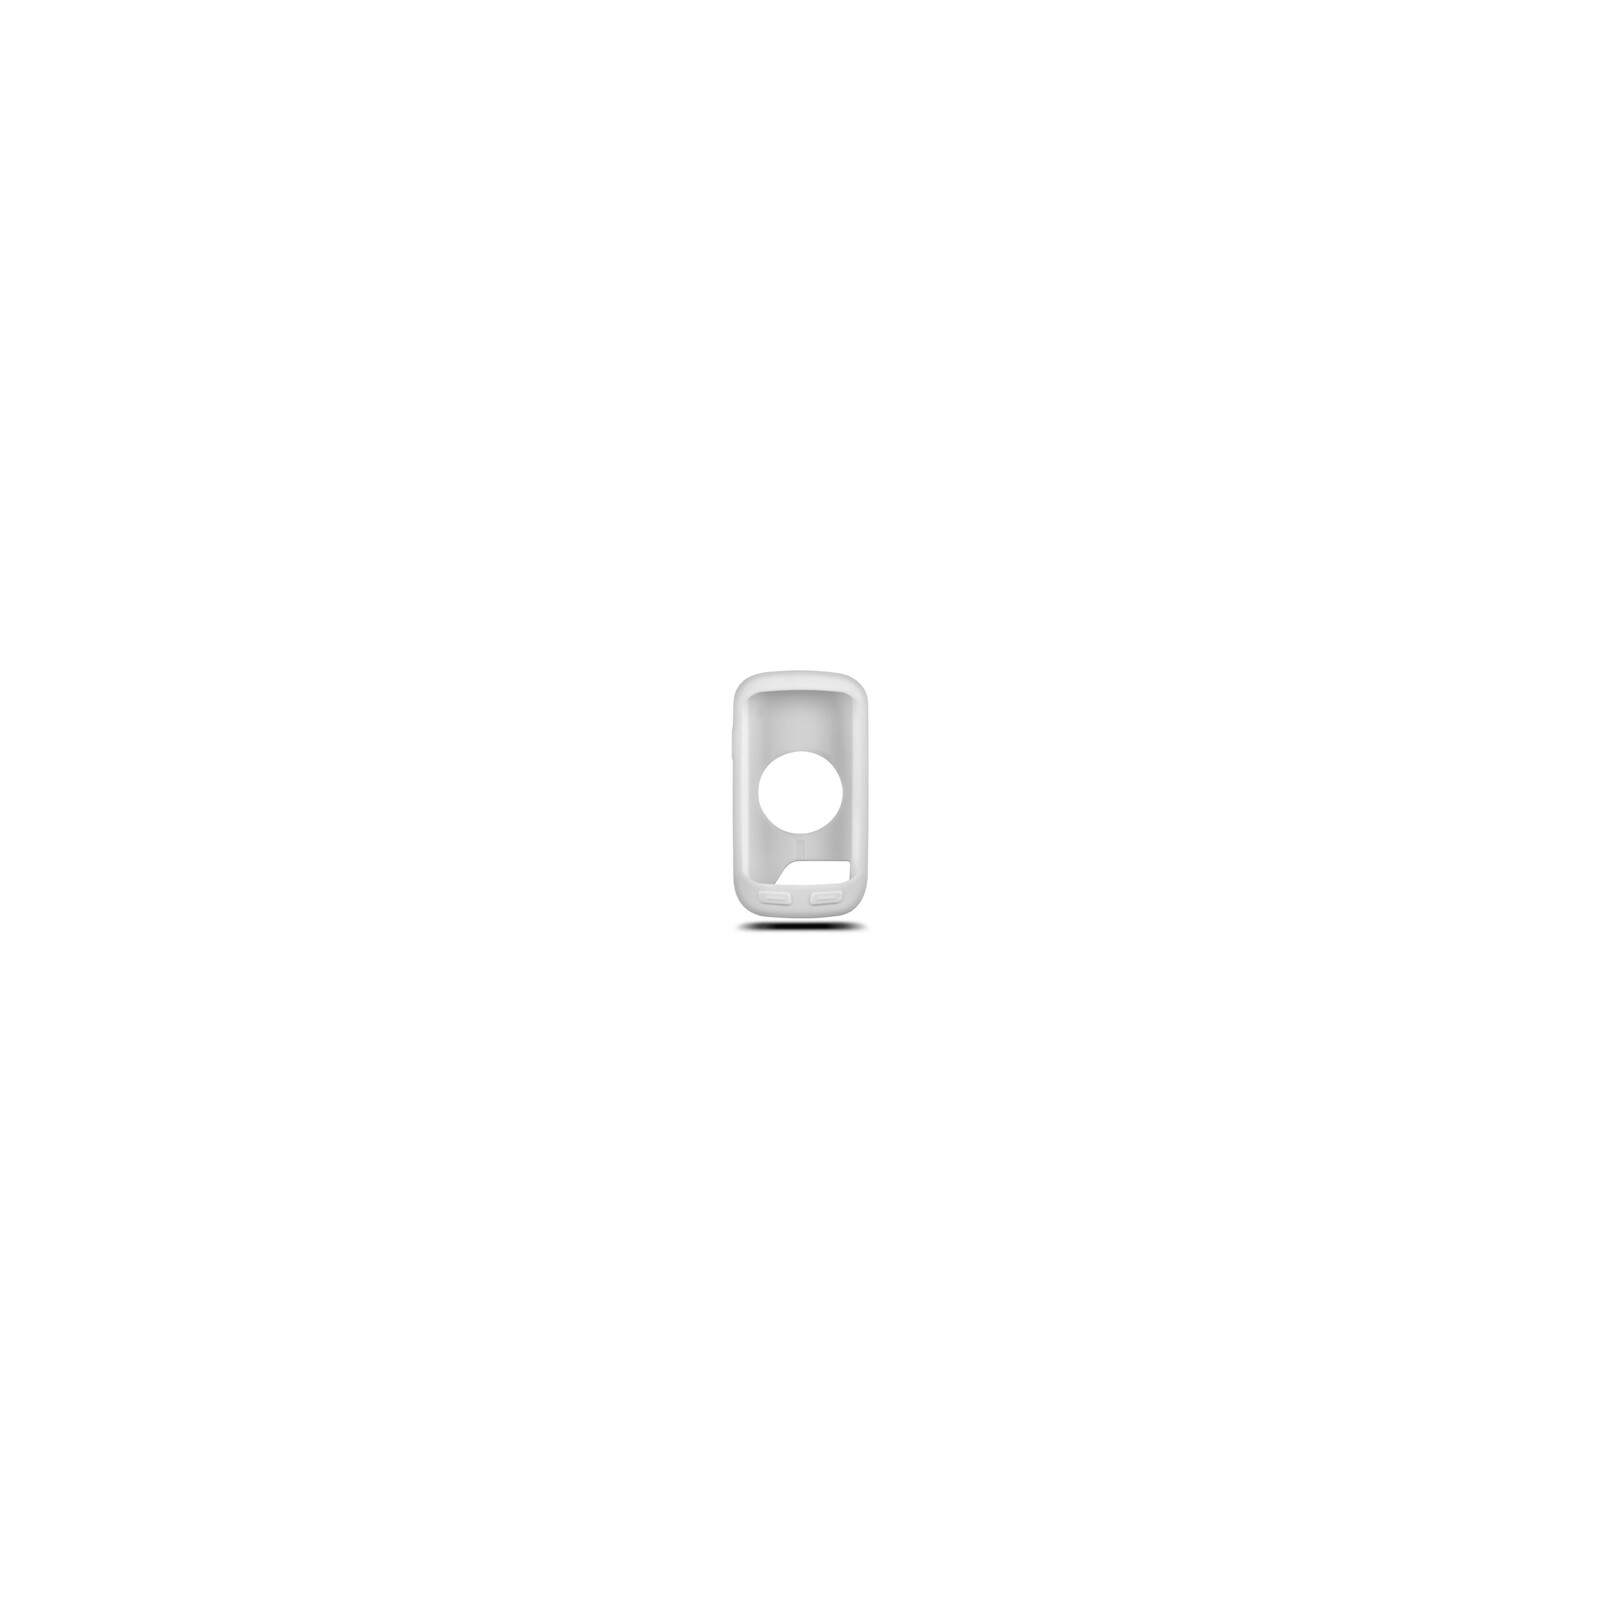 Garmin Edge 1000 Schutzhülle white